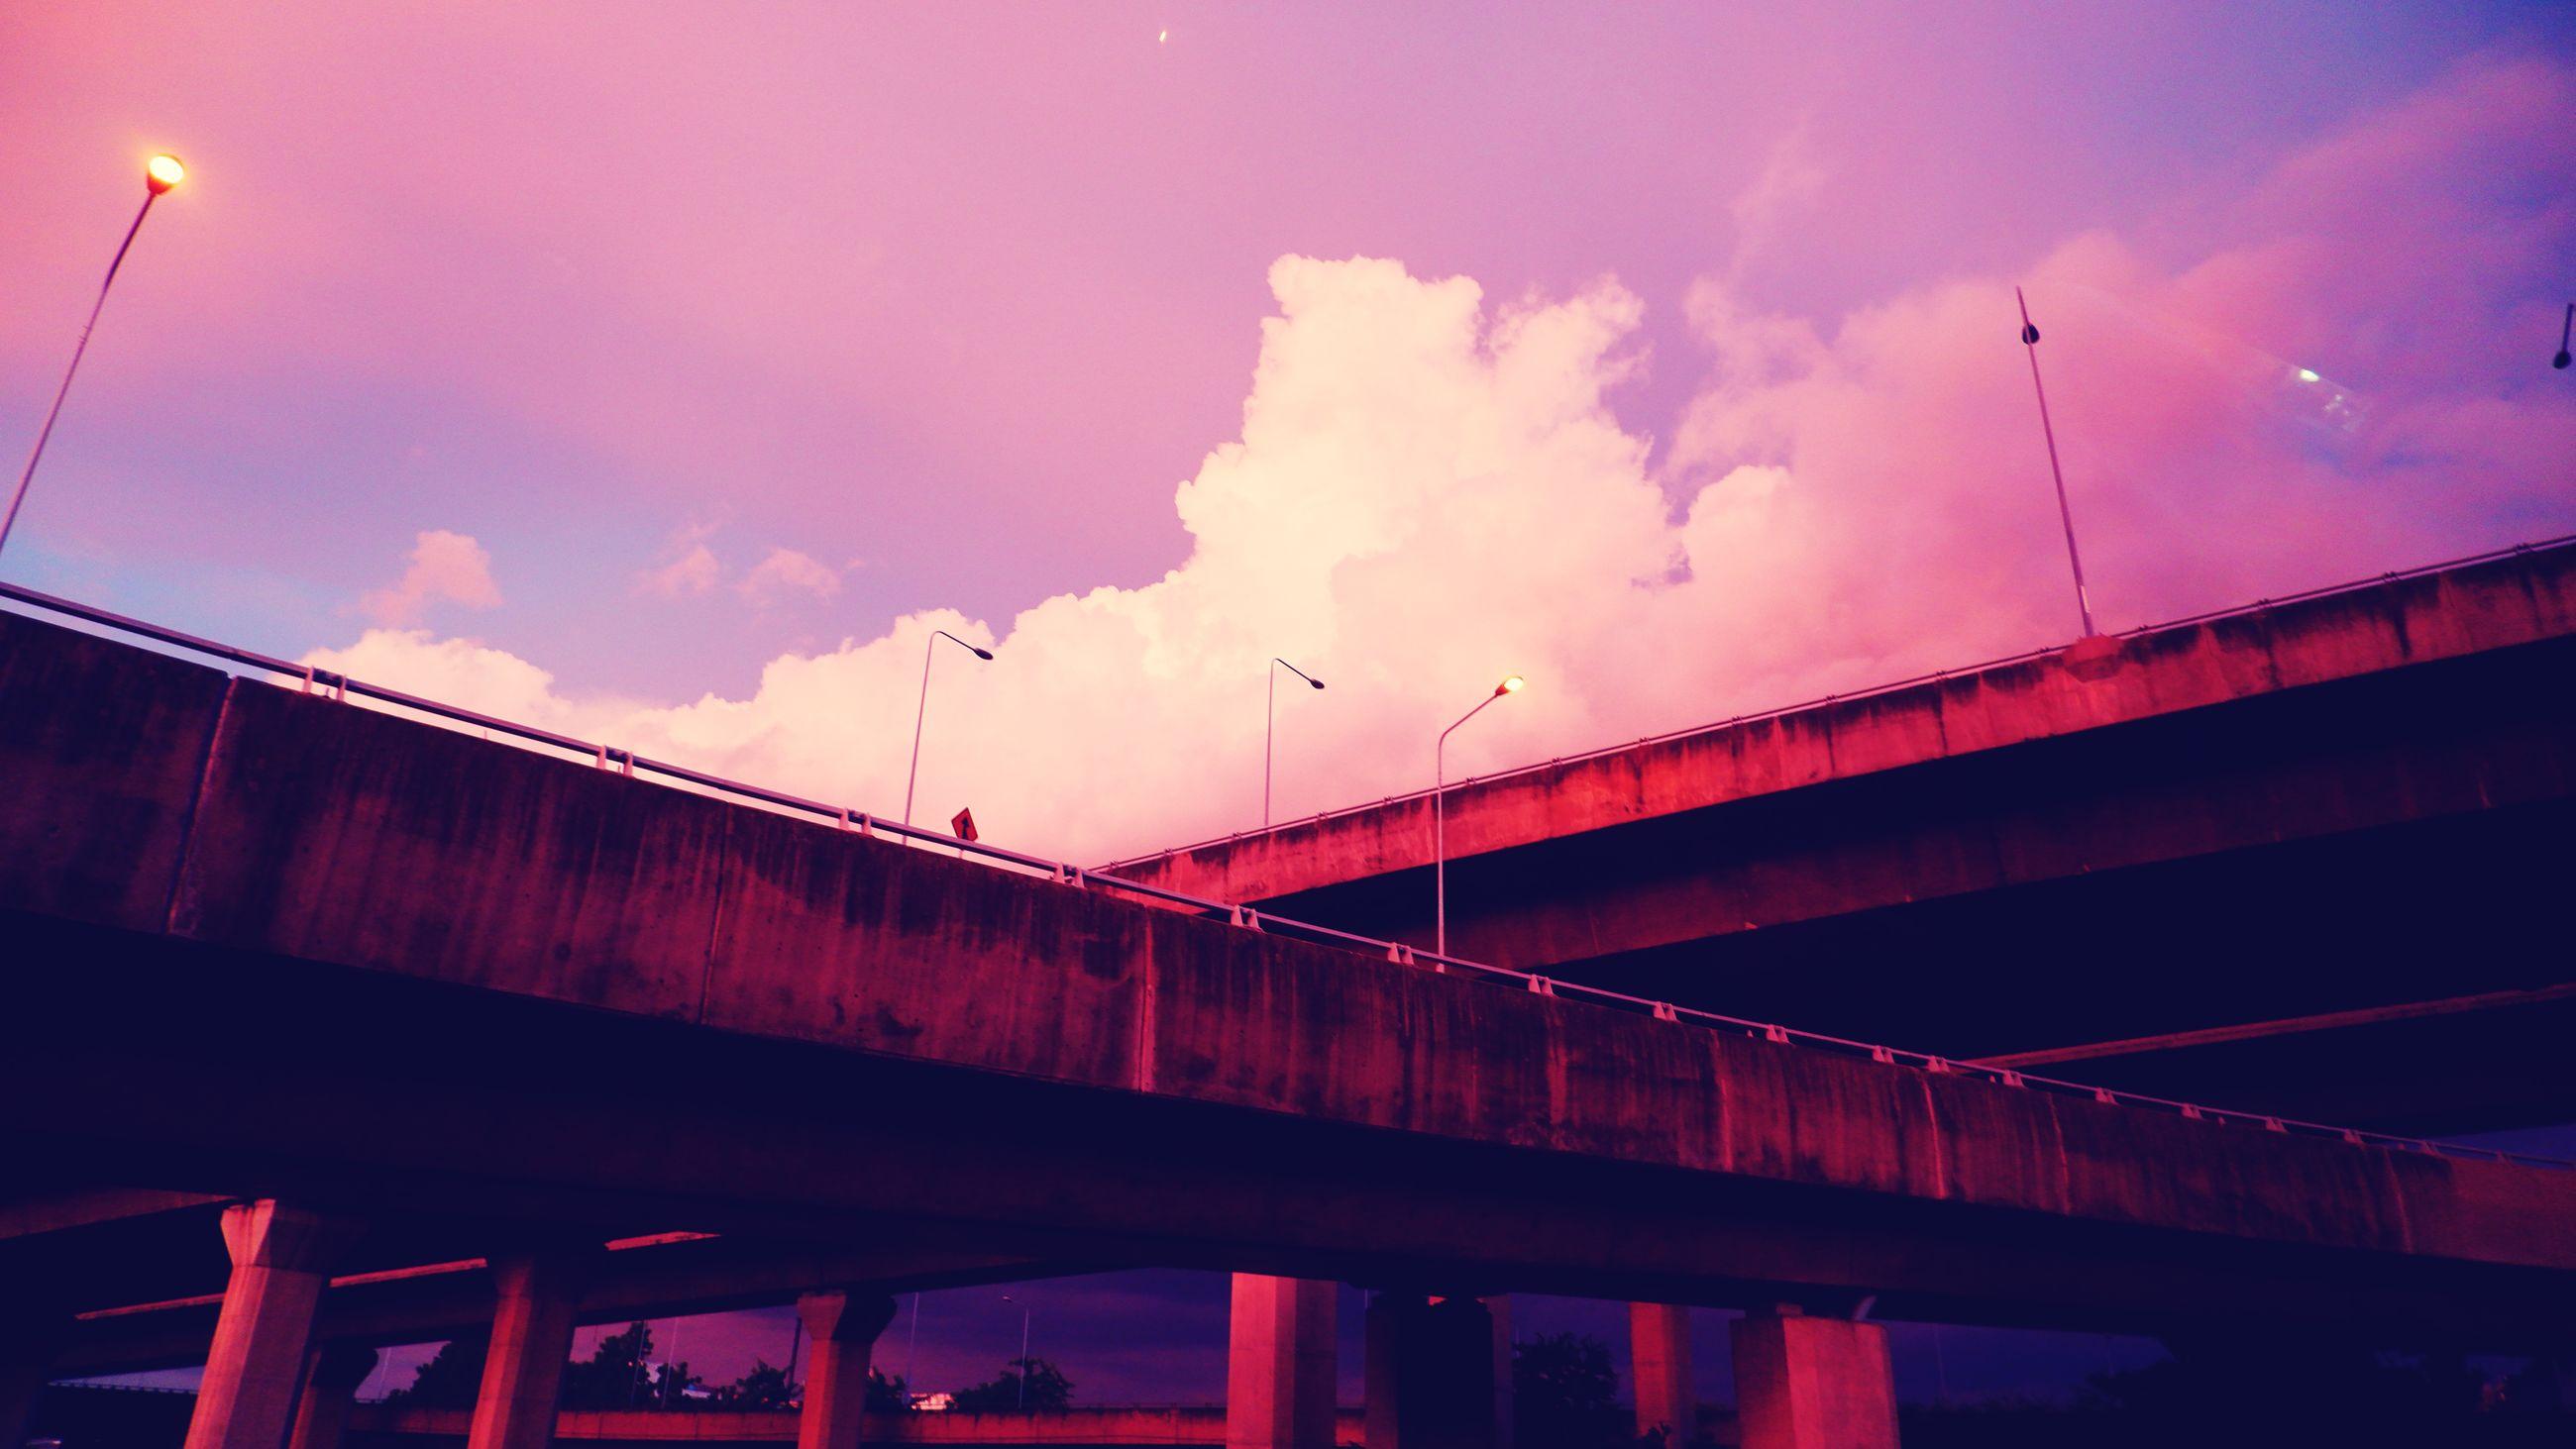 bridge, architecture, sky, cloud, built structure, night, evening, transportation, reflection, dusk, nature, sunset, light, no people, low angle view, city, beam bridge, street light, outdoors, darkness, building exterior, illuminated, street, cityscape